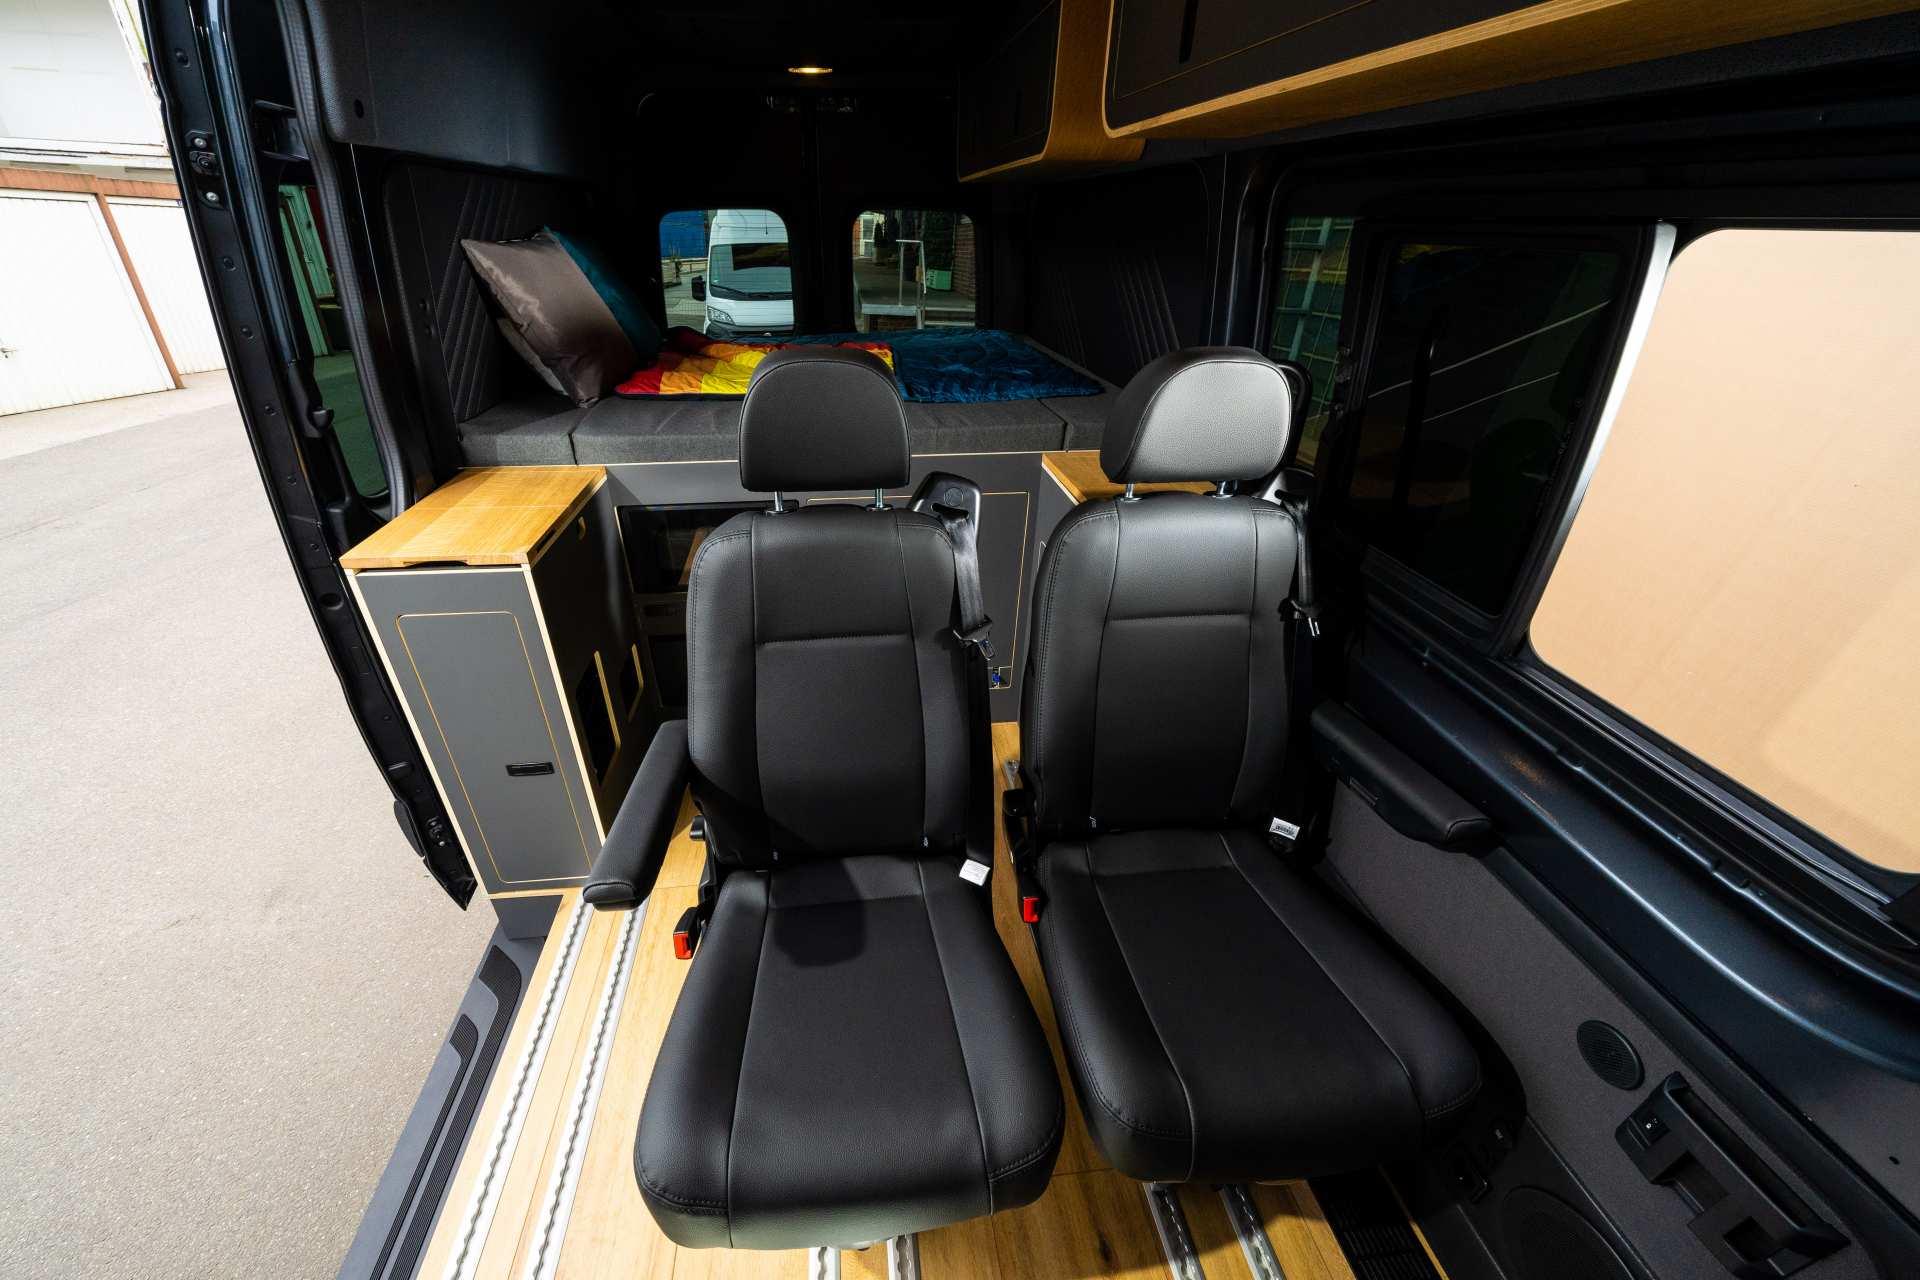 Individualausbau: Mercedes L2 H2 Mixto - 2